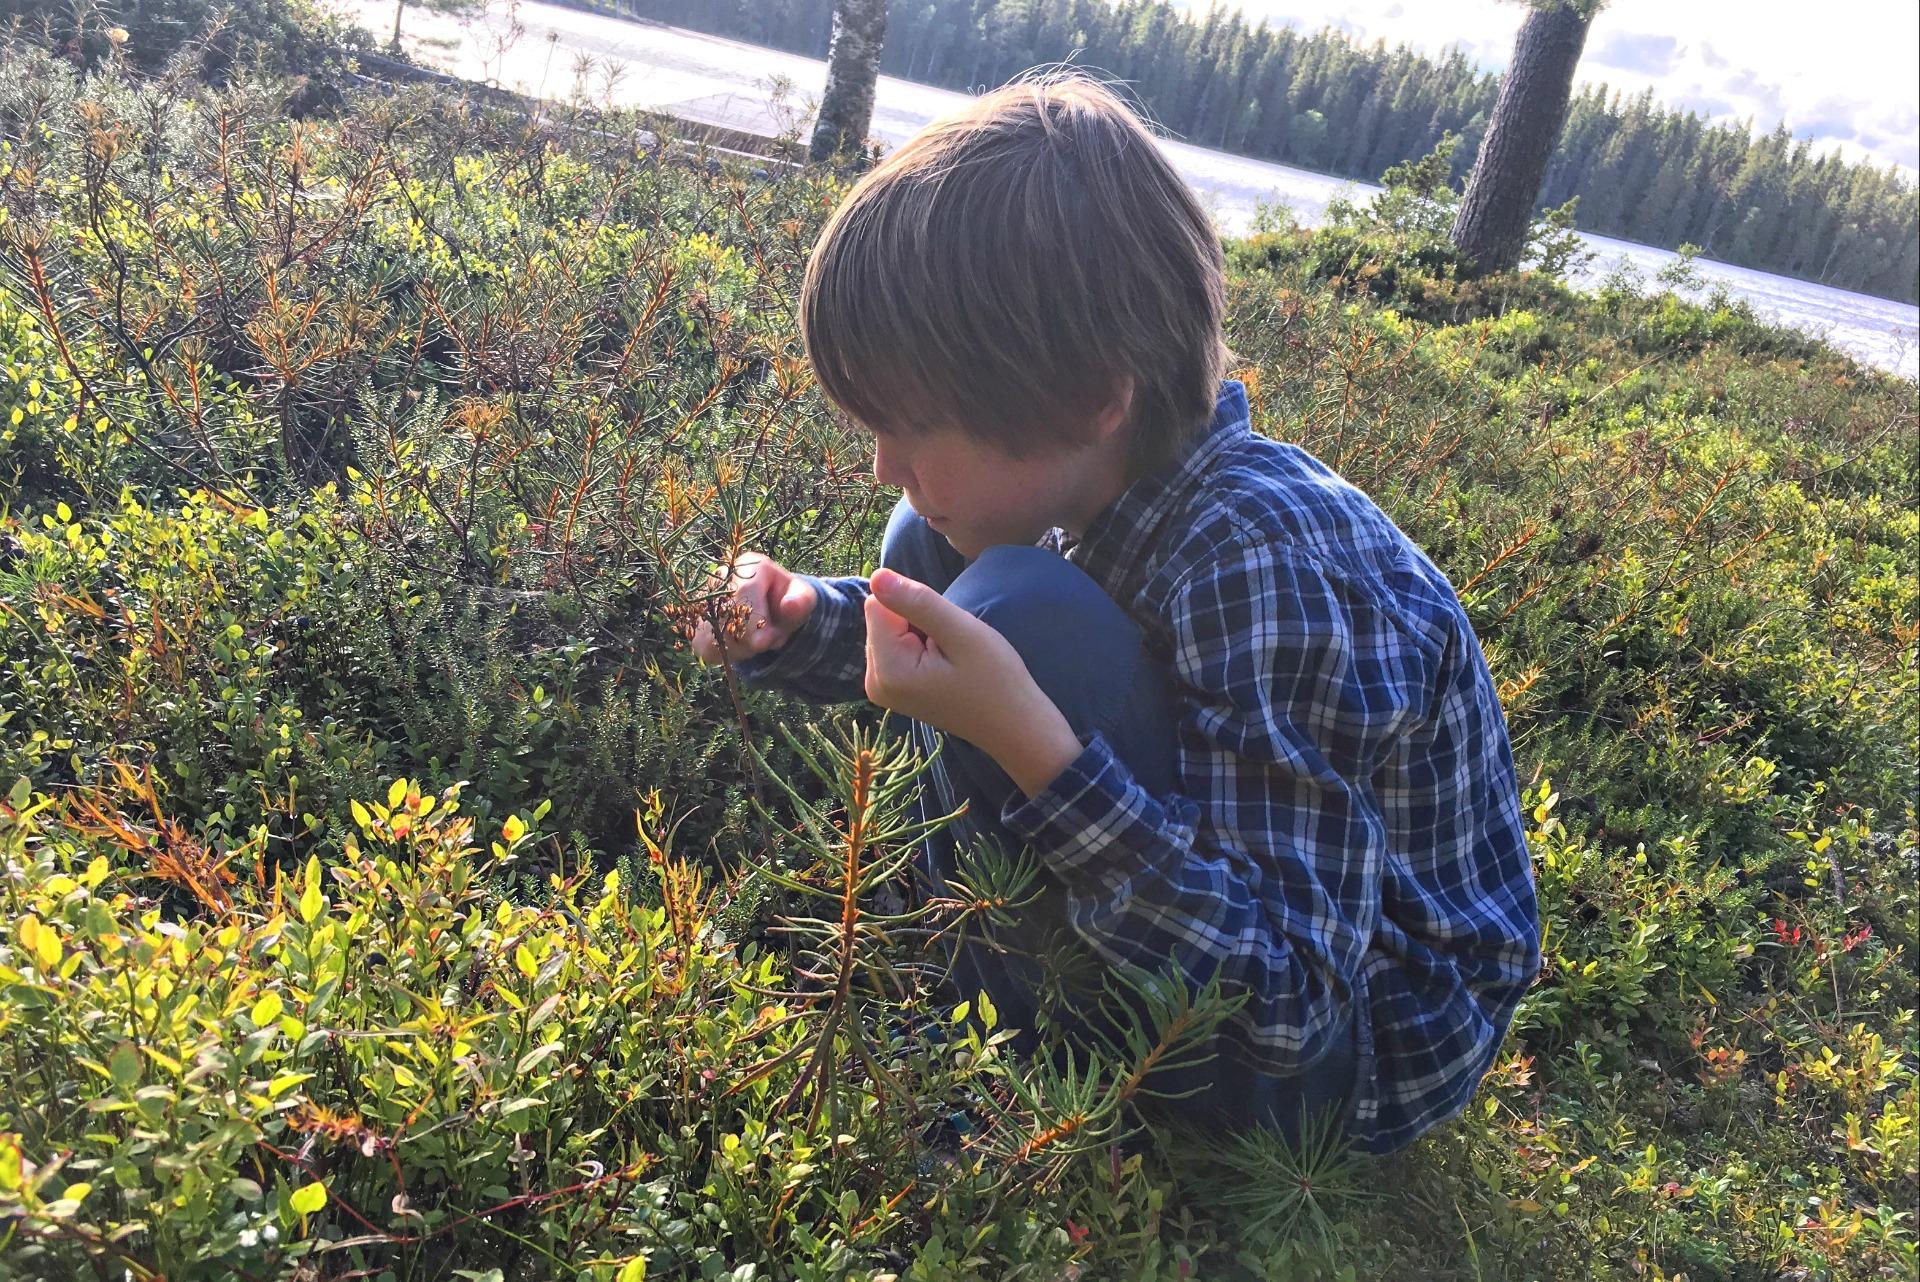 Picking blueberries in Sweden.